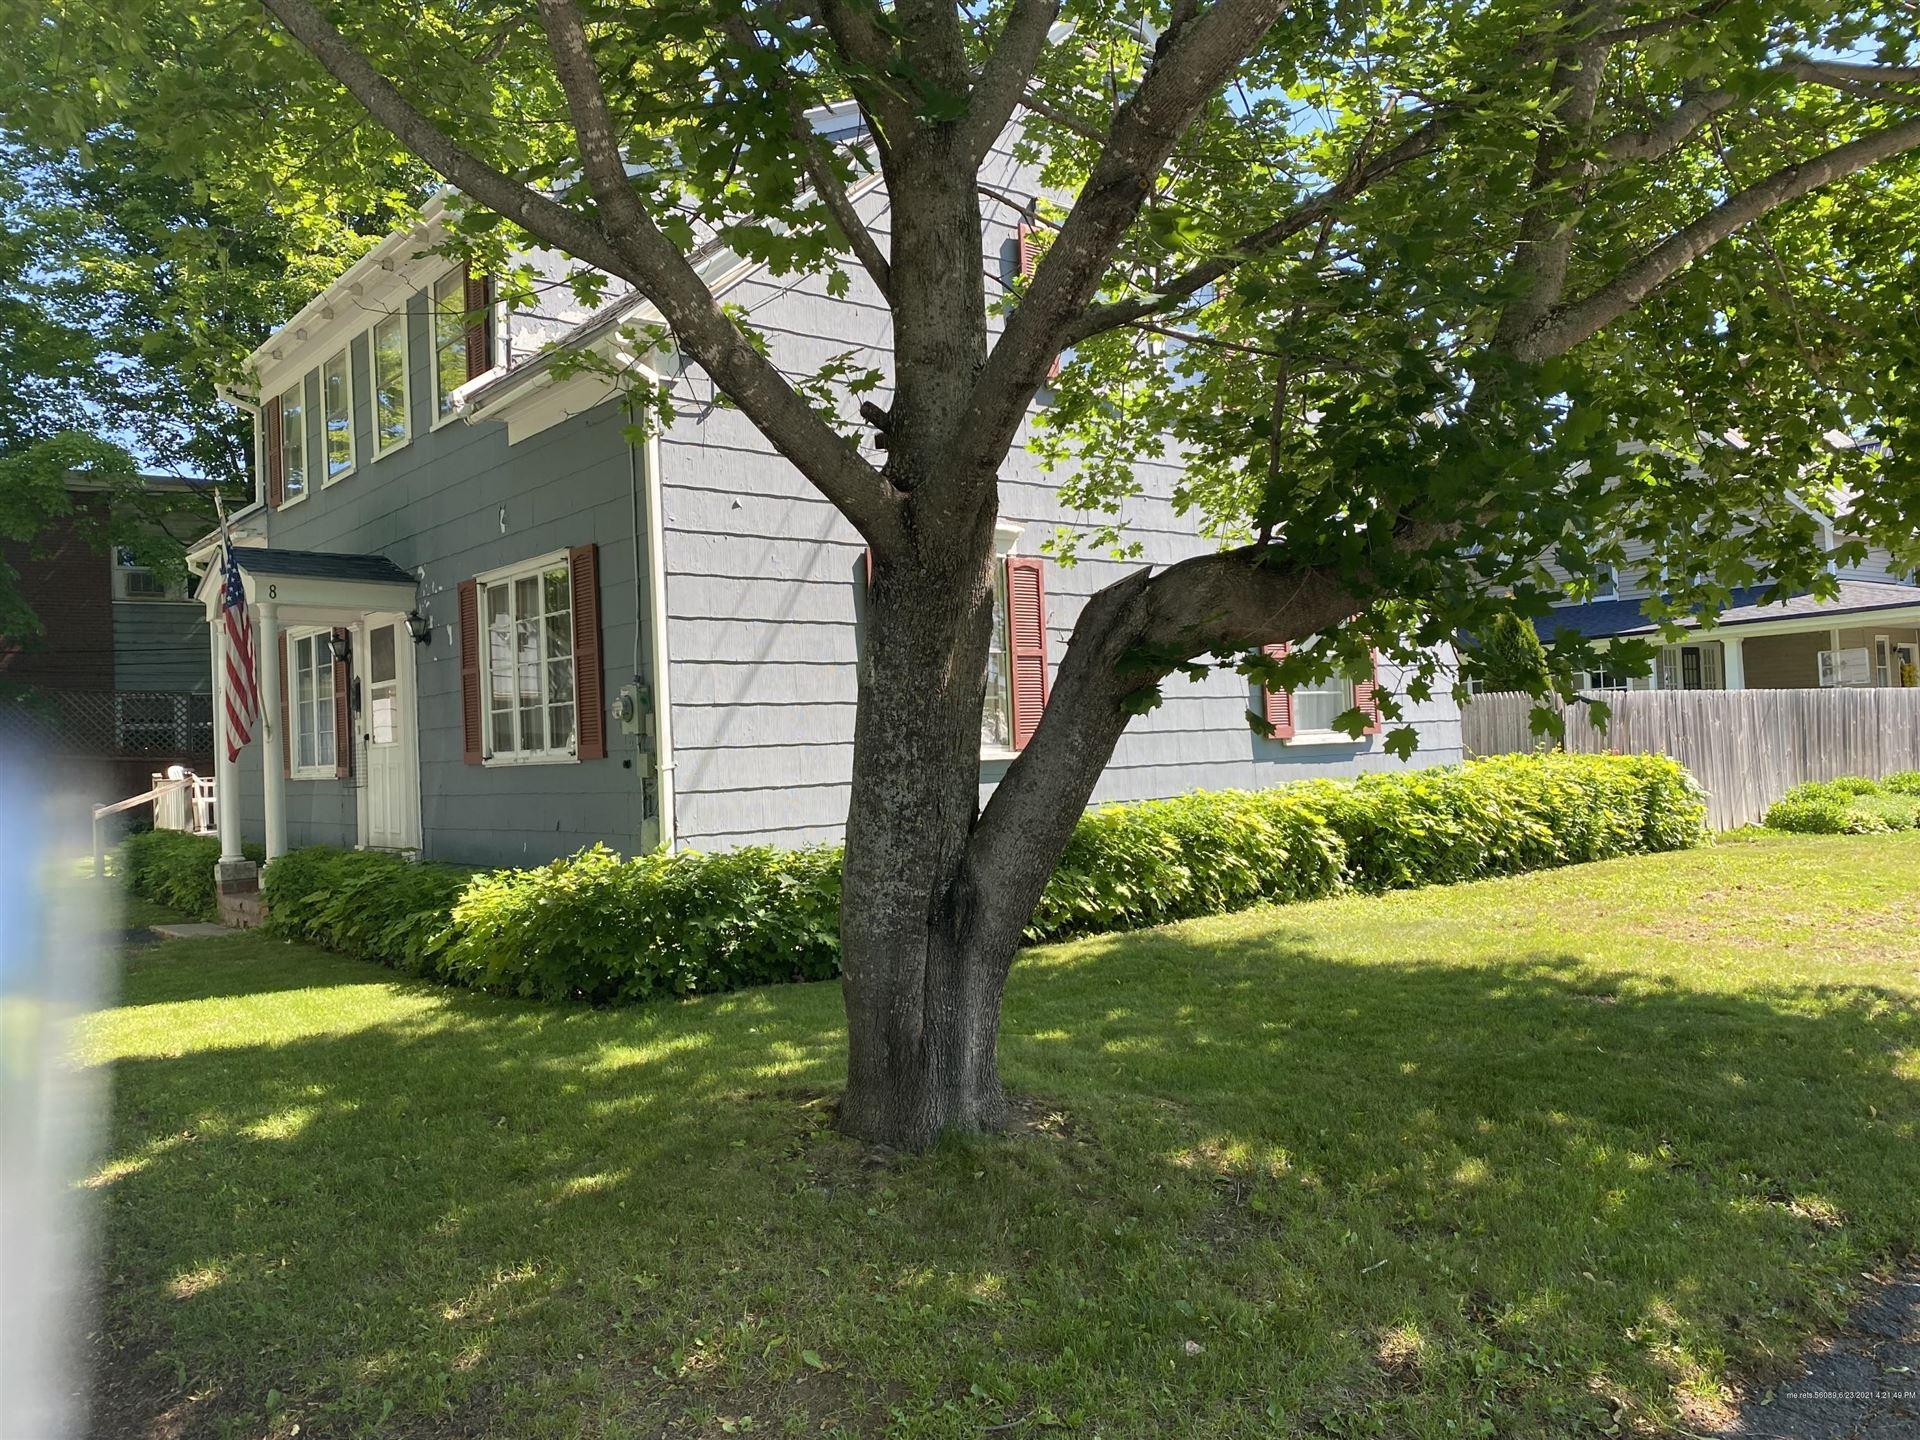 Photo of 8 Thomas Avenue, Caribou, ME 04736 (MLS # 1497012)